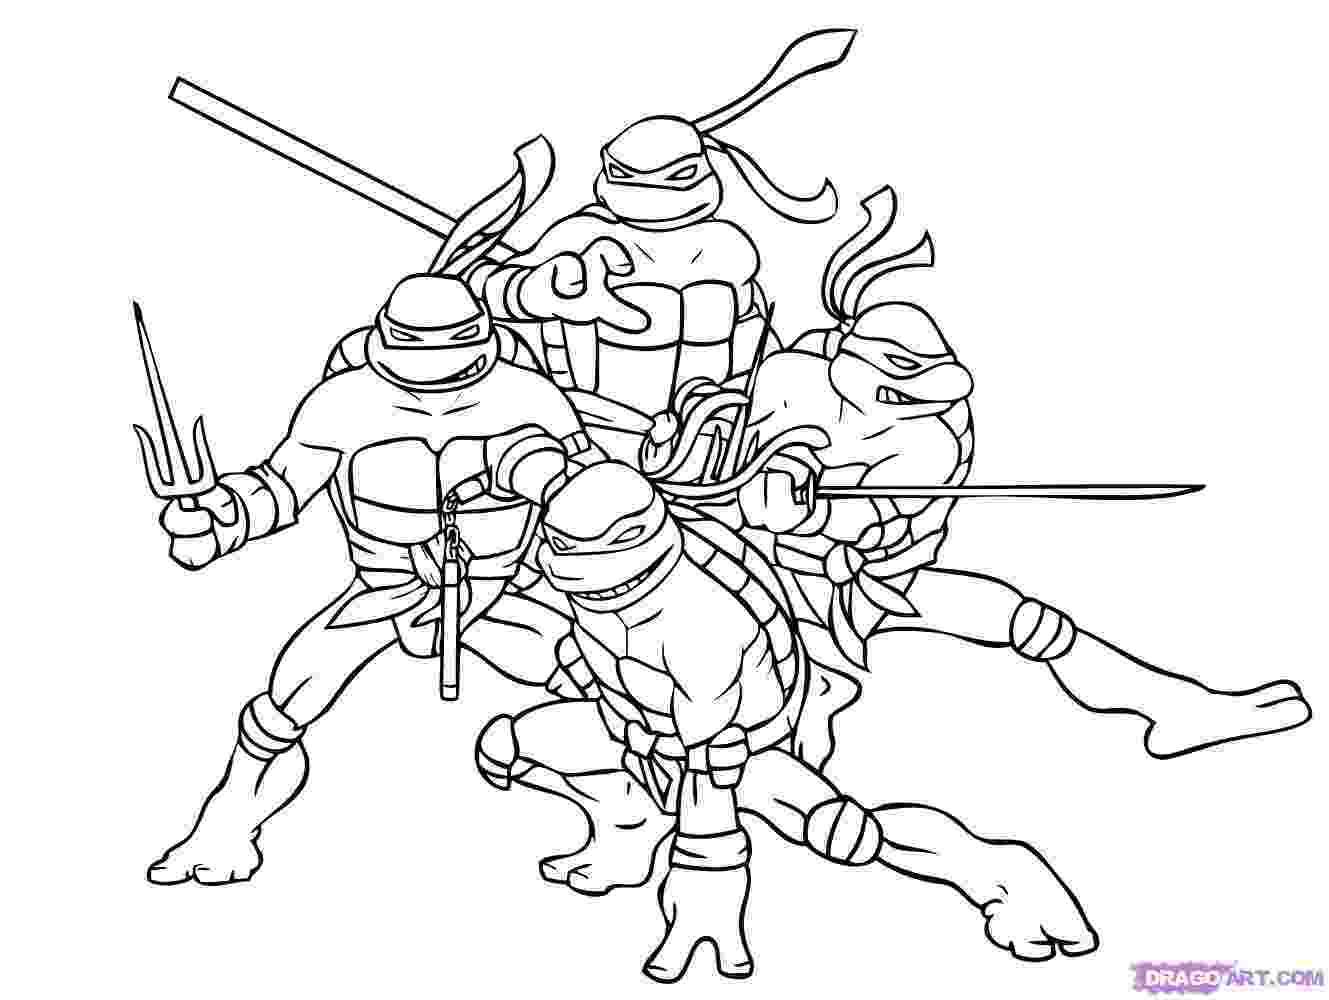 ninja turtle coloring sheets get this teenage mutant ninja turtles coloring pages free turtle ninja sheets coloring